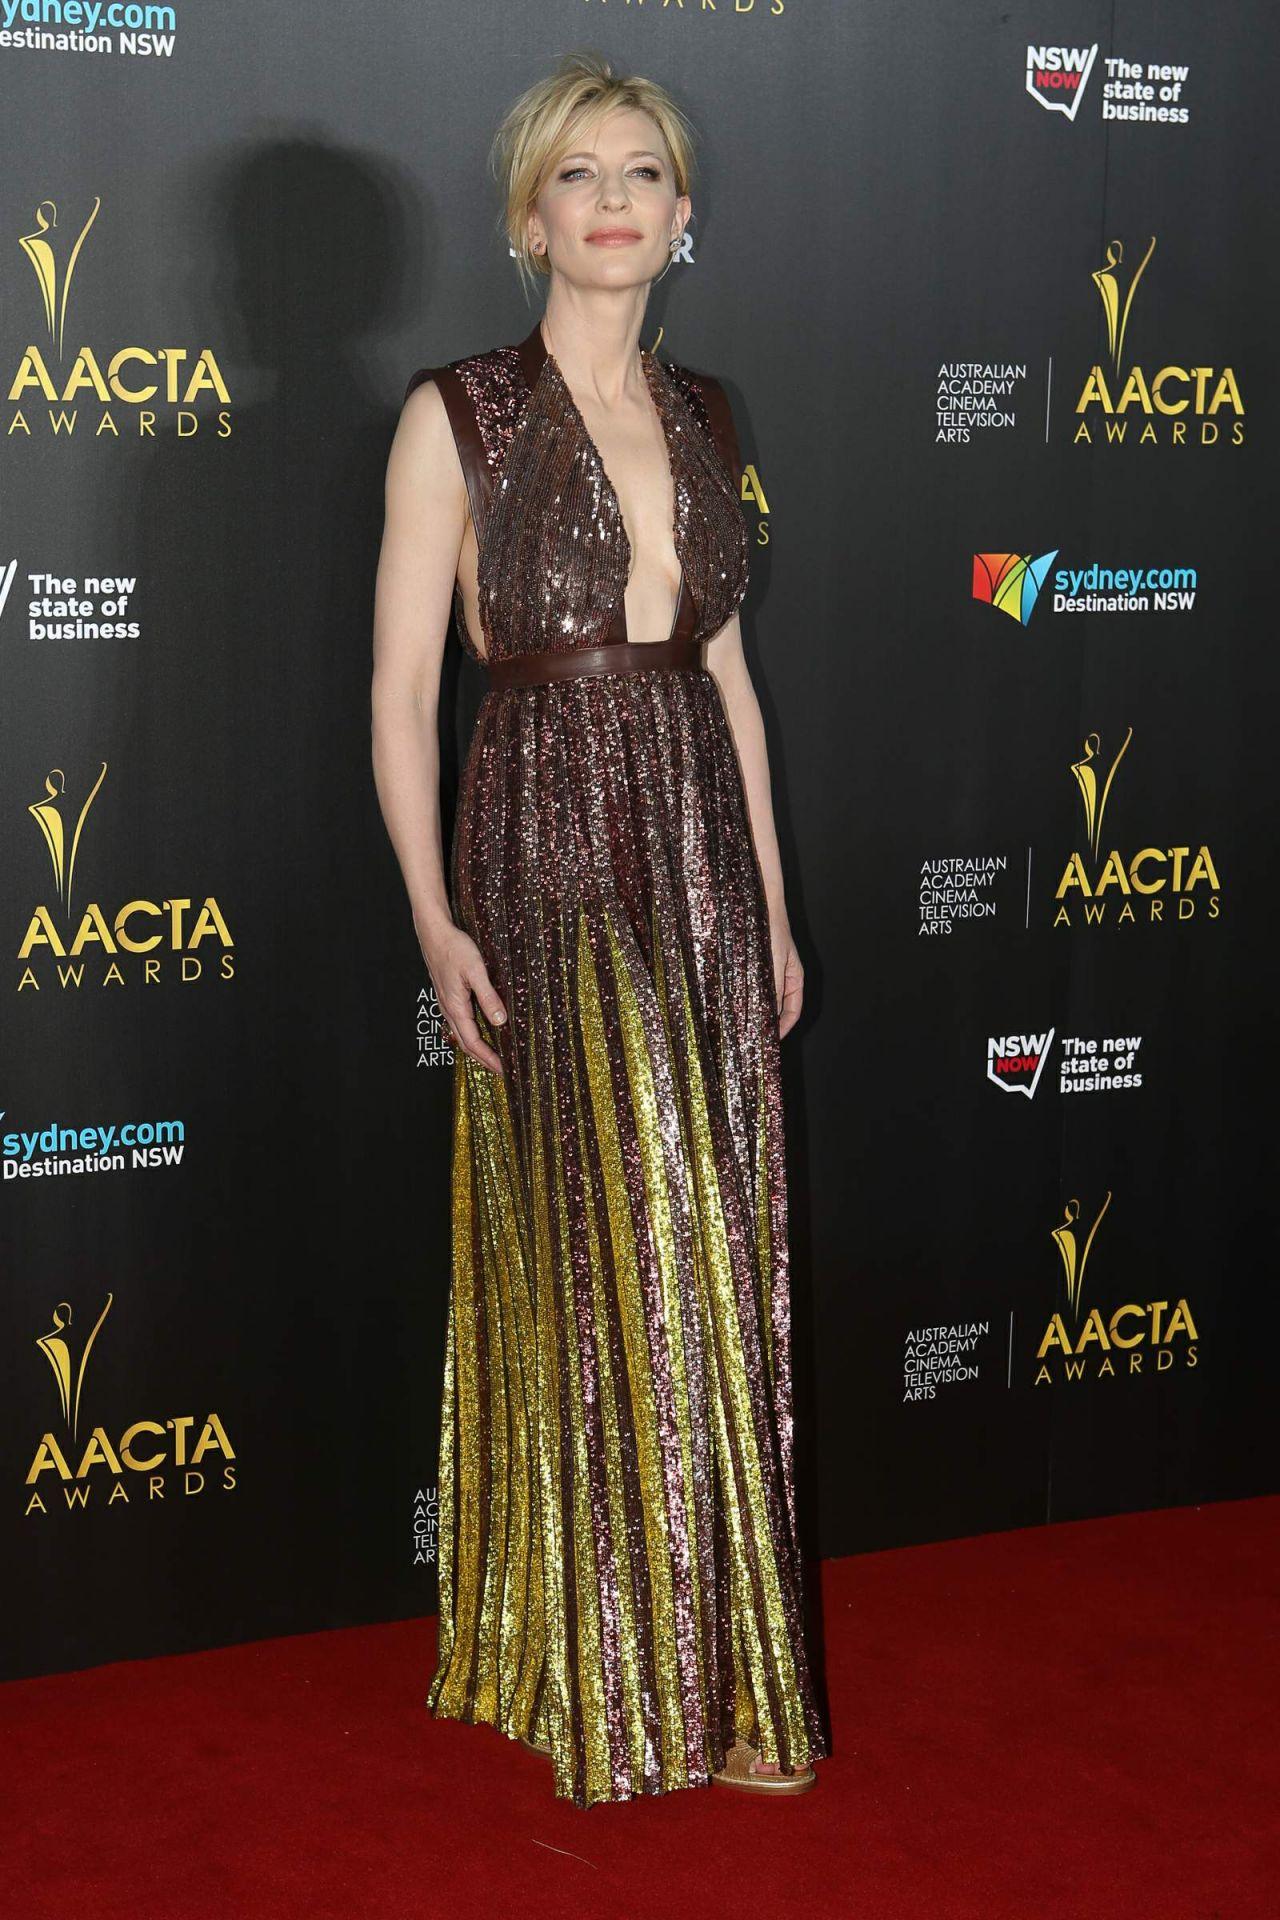 aacta awards - photo #28